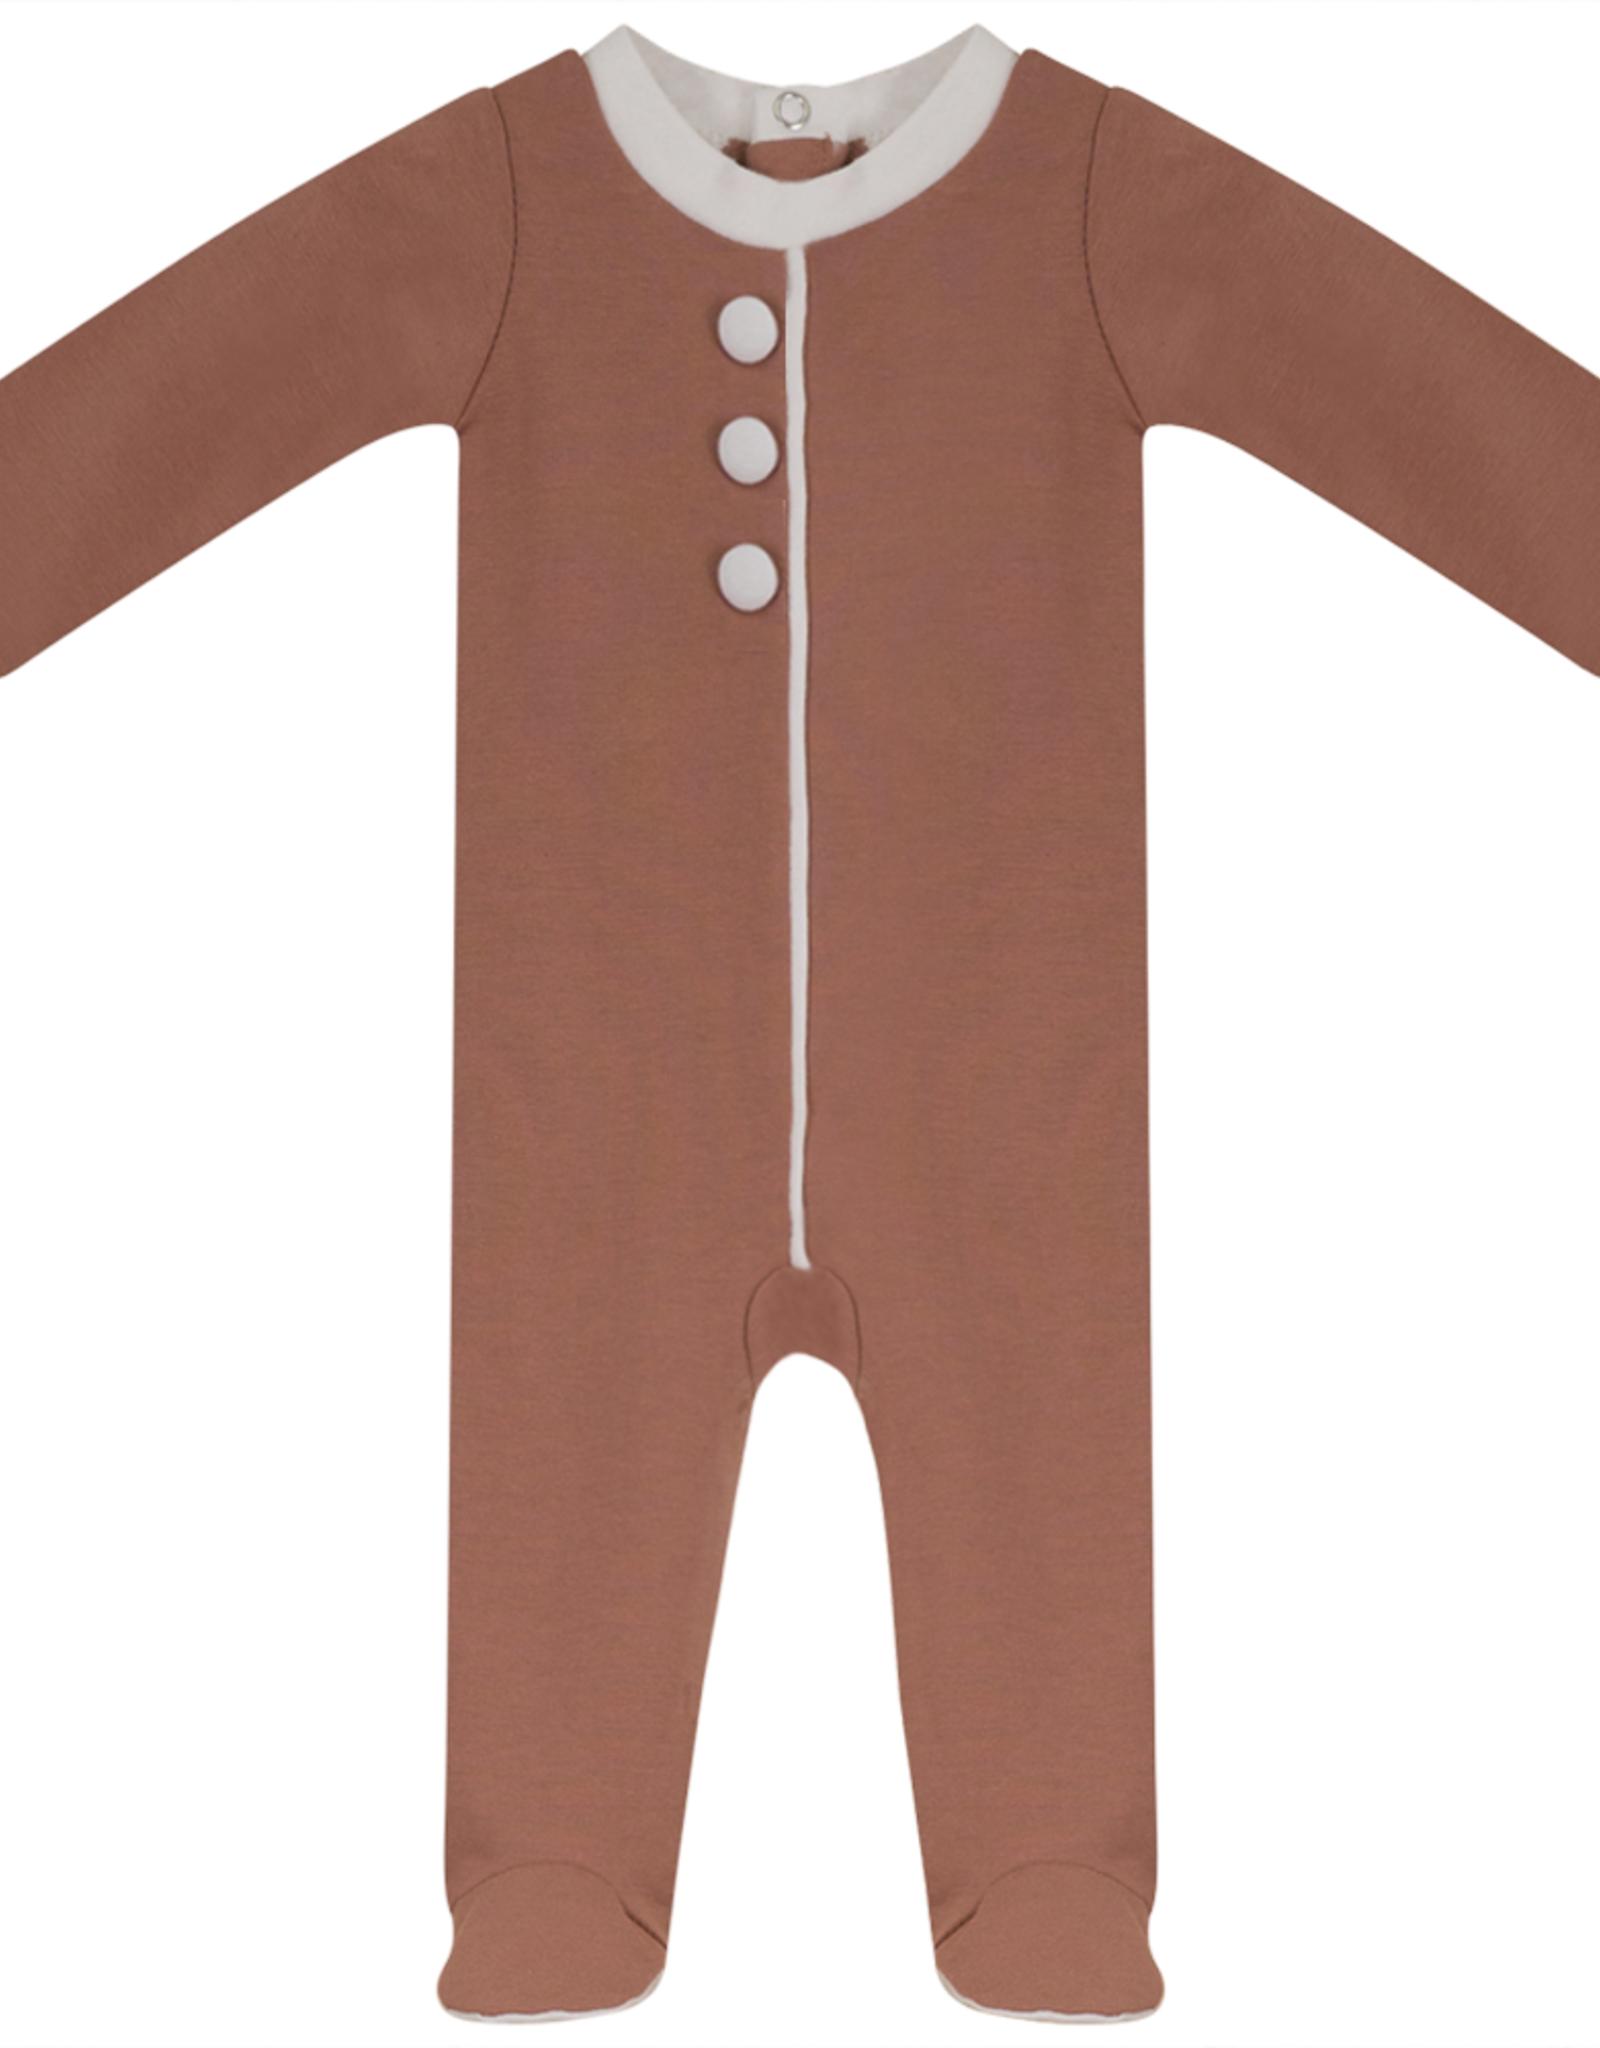 FRAGILE Fragile Faux Button Footie Pajama with Trim